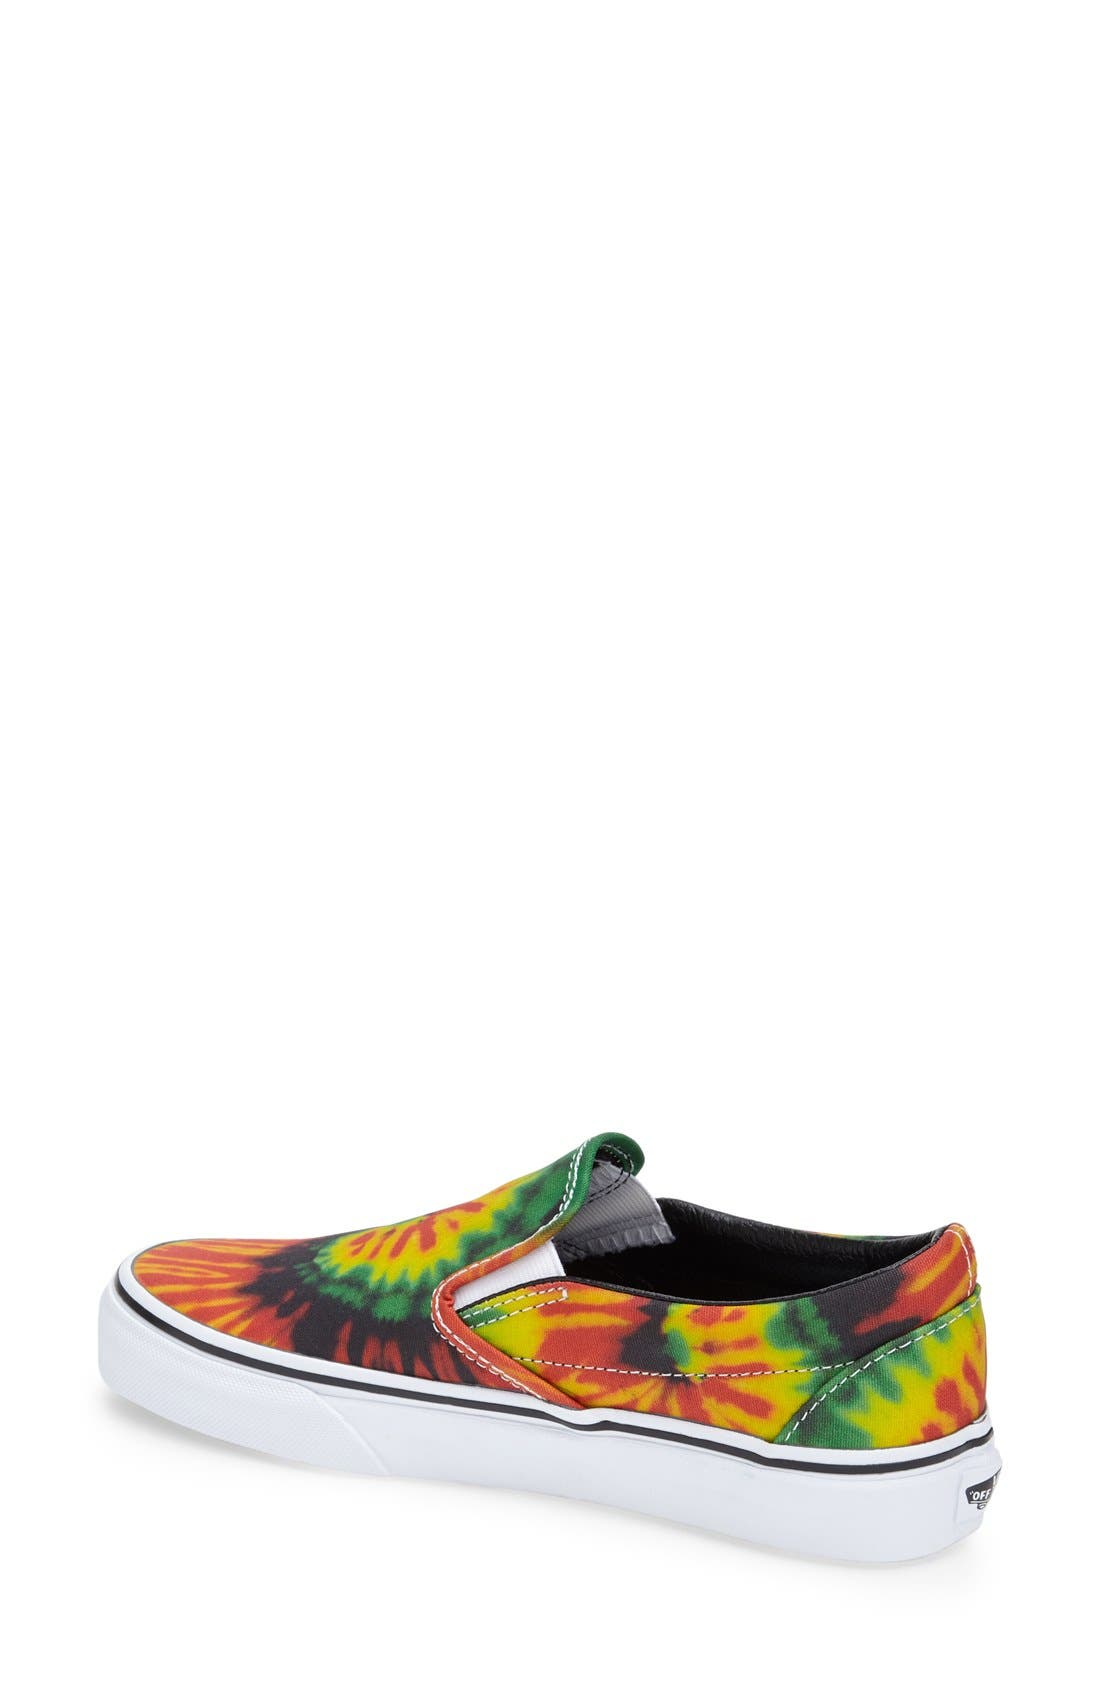 Alternate Image 2  - Vans 'Tie Dye' Slip-On Sneaker (Women)